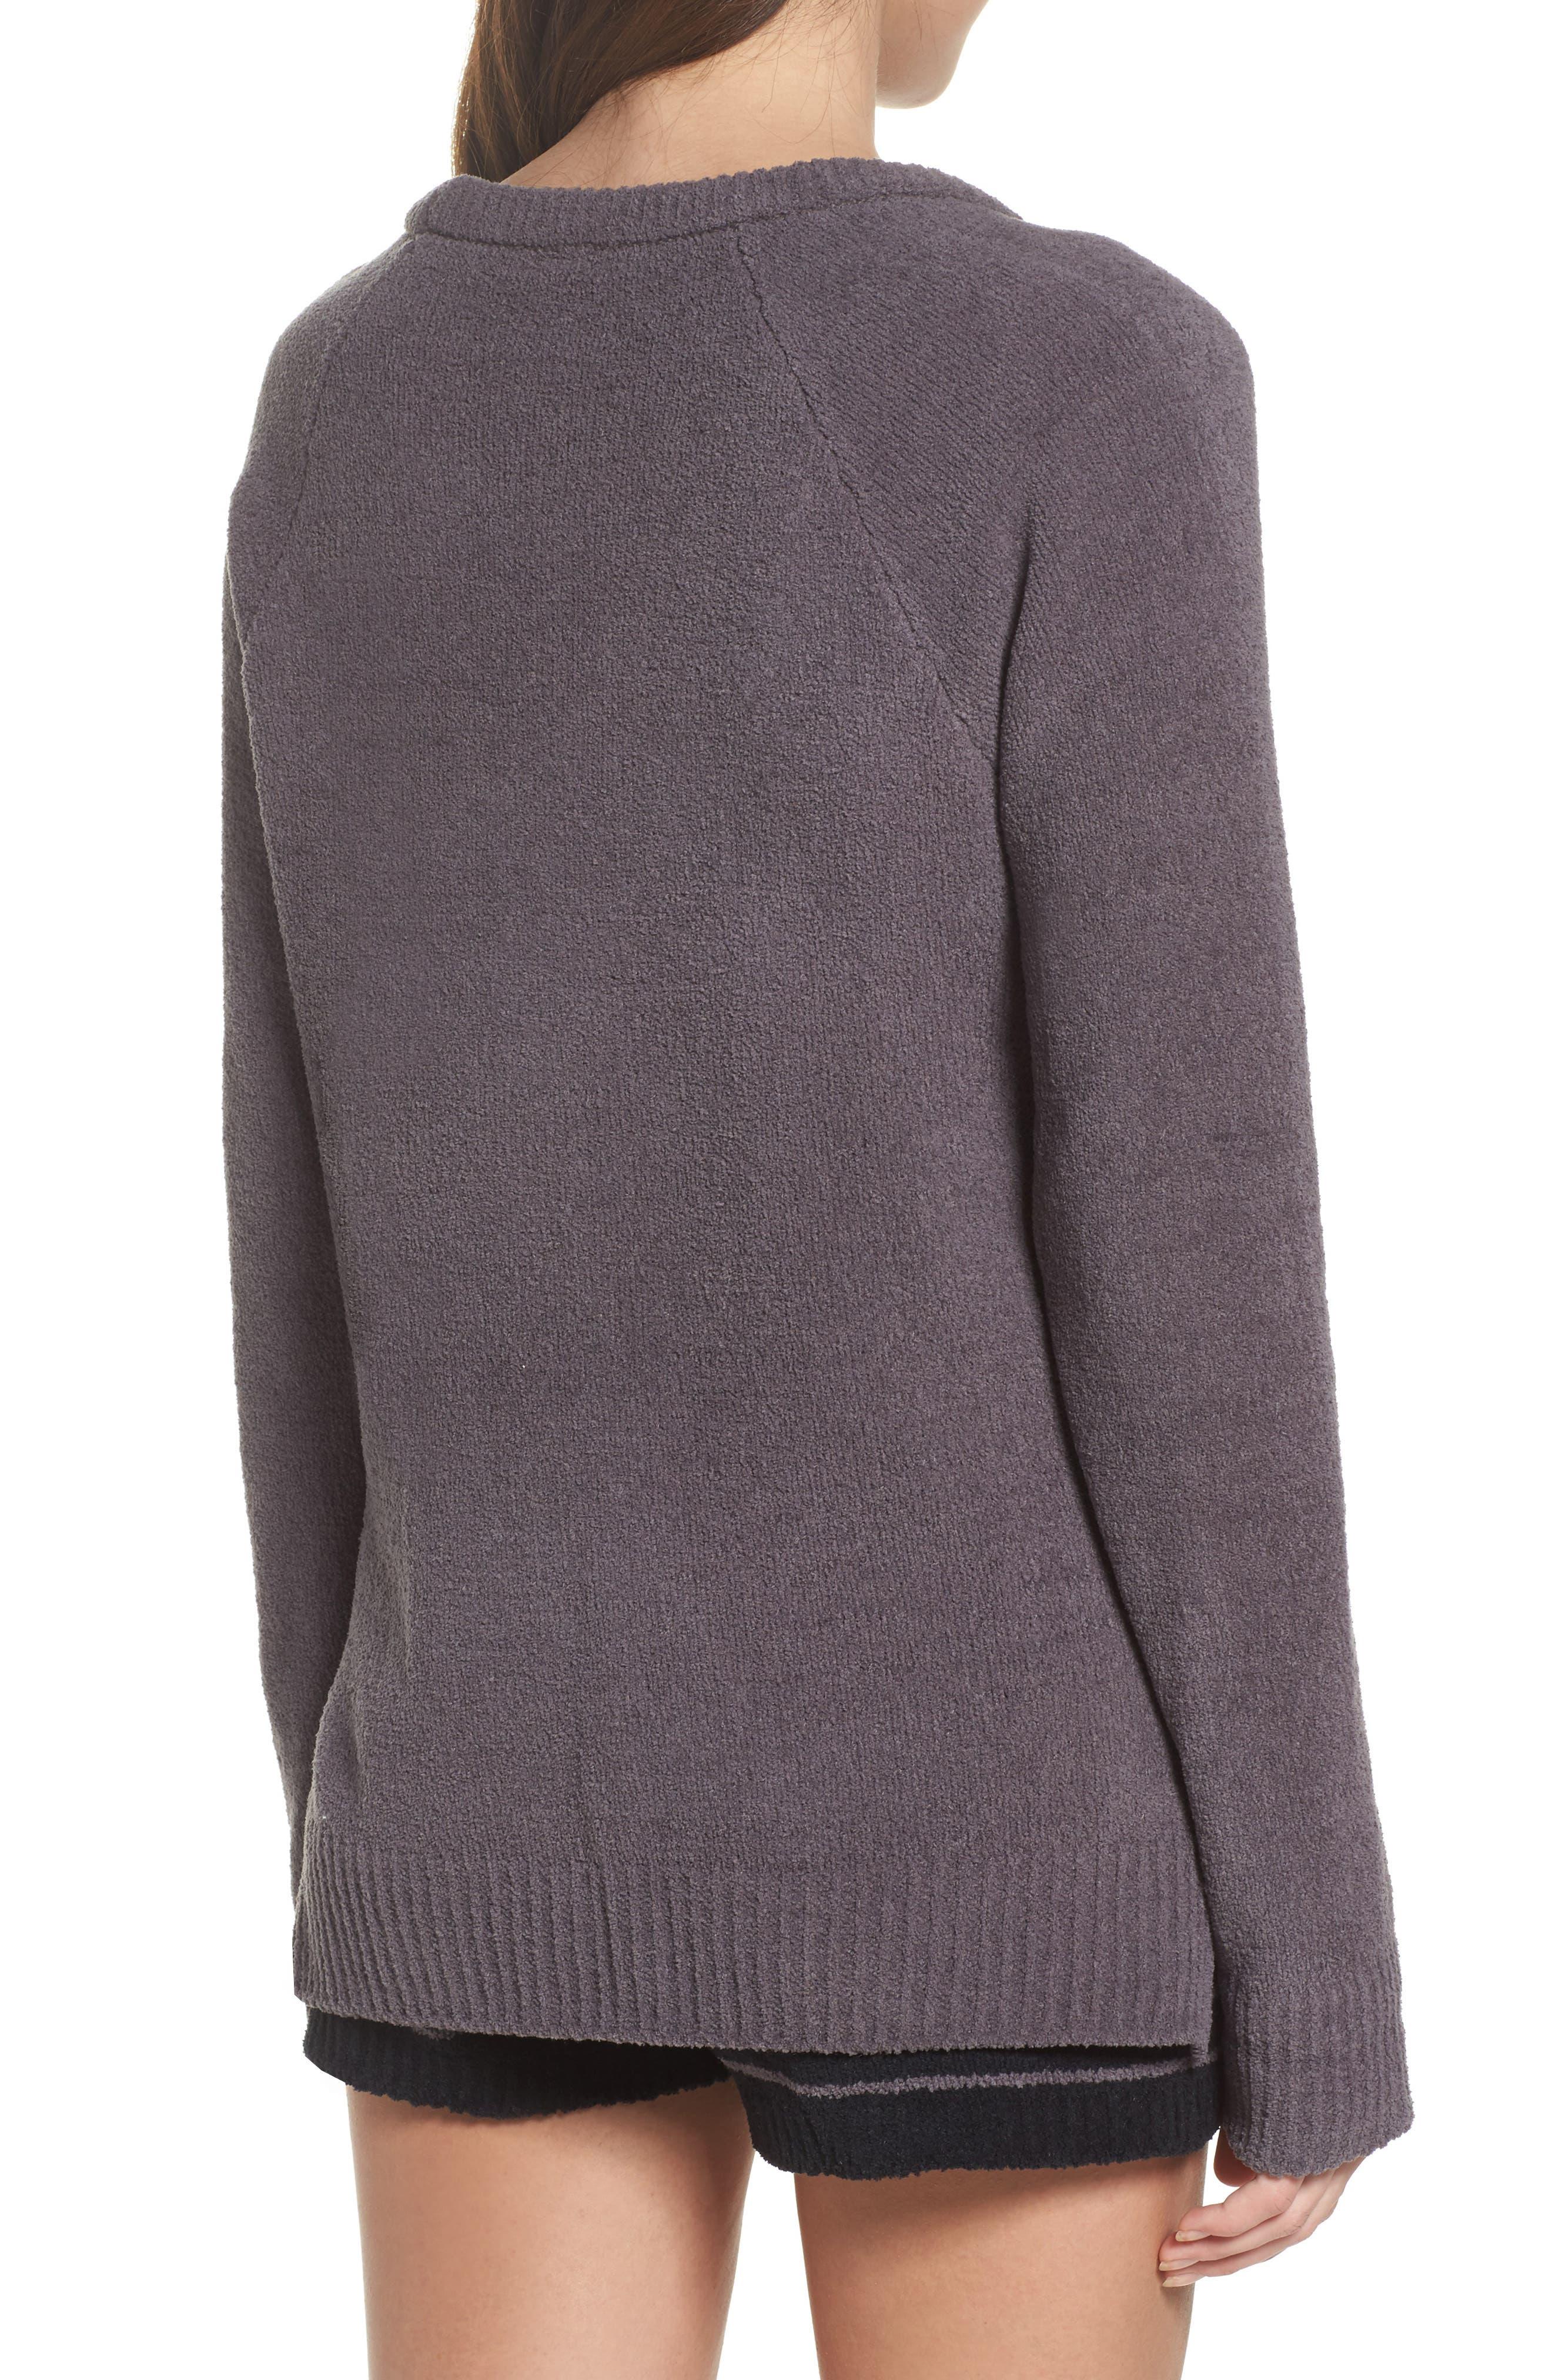 Marshmallow Sweatshirt,                             Alternate thumbnail 2, color,                             Charcoal